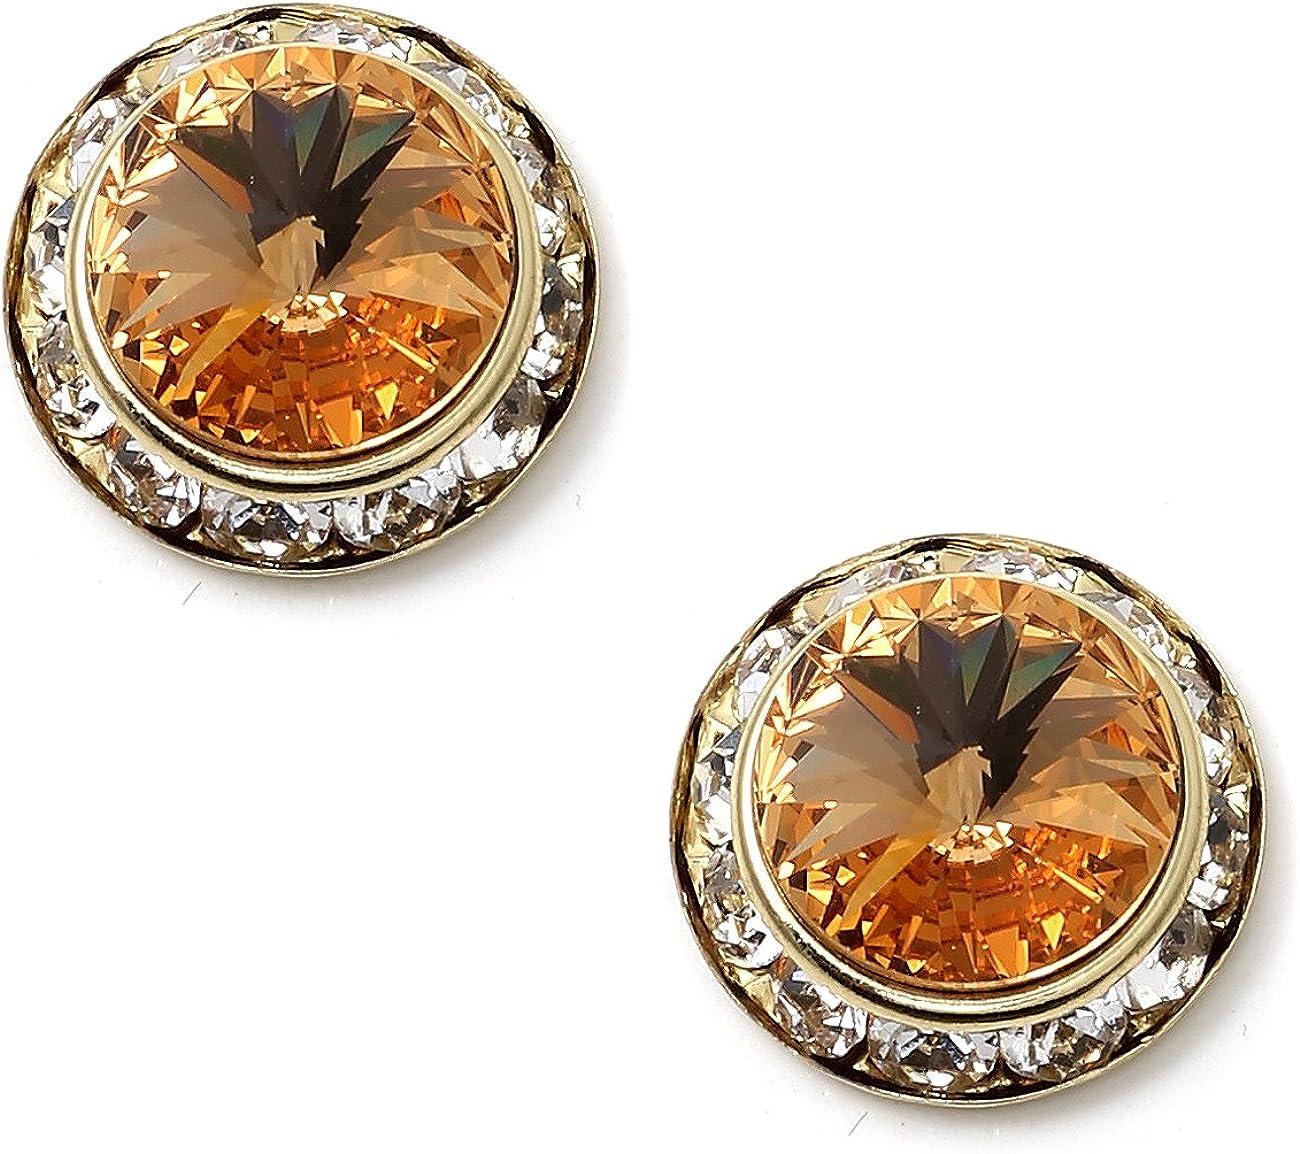 Gold Plating Element Light Colorado Topaz Rhinestone 15mm Rondelle Circle Round Shape Stud Earring